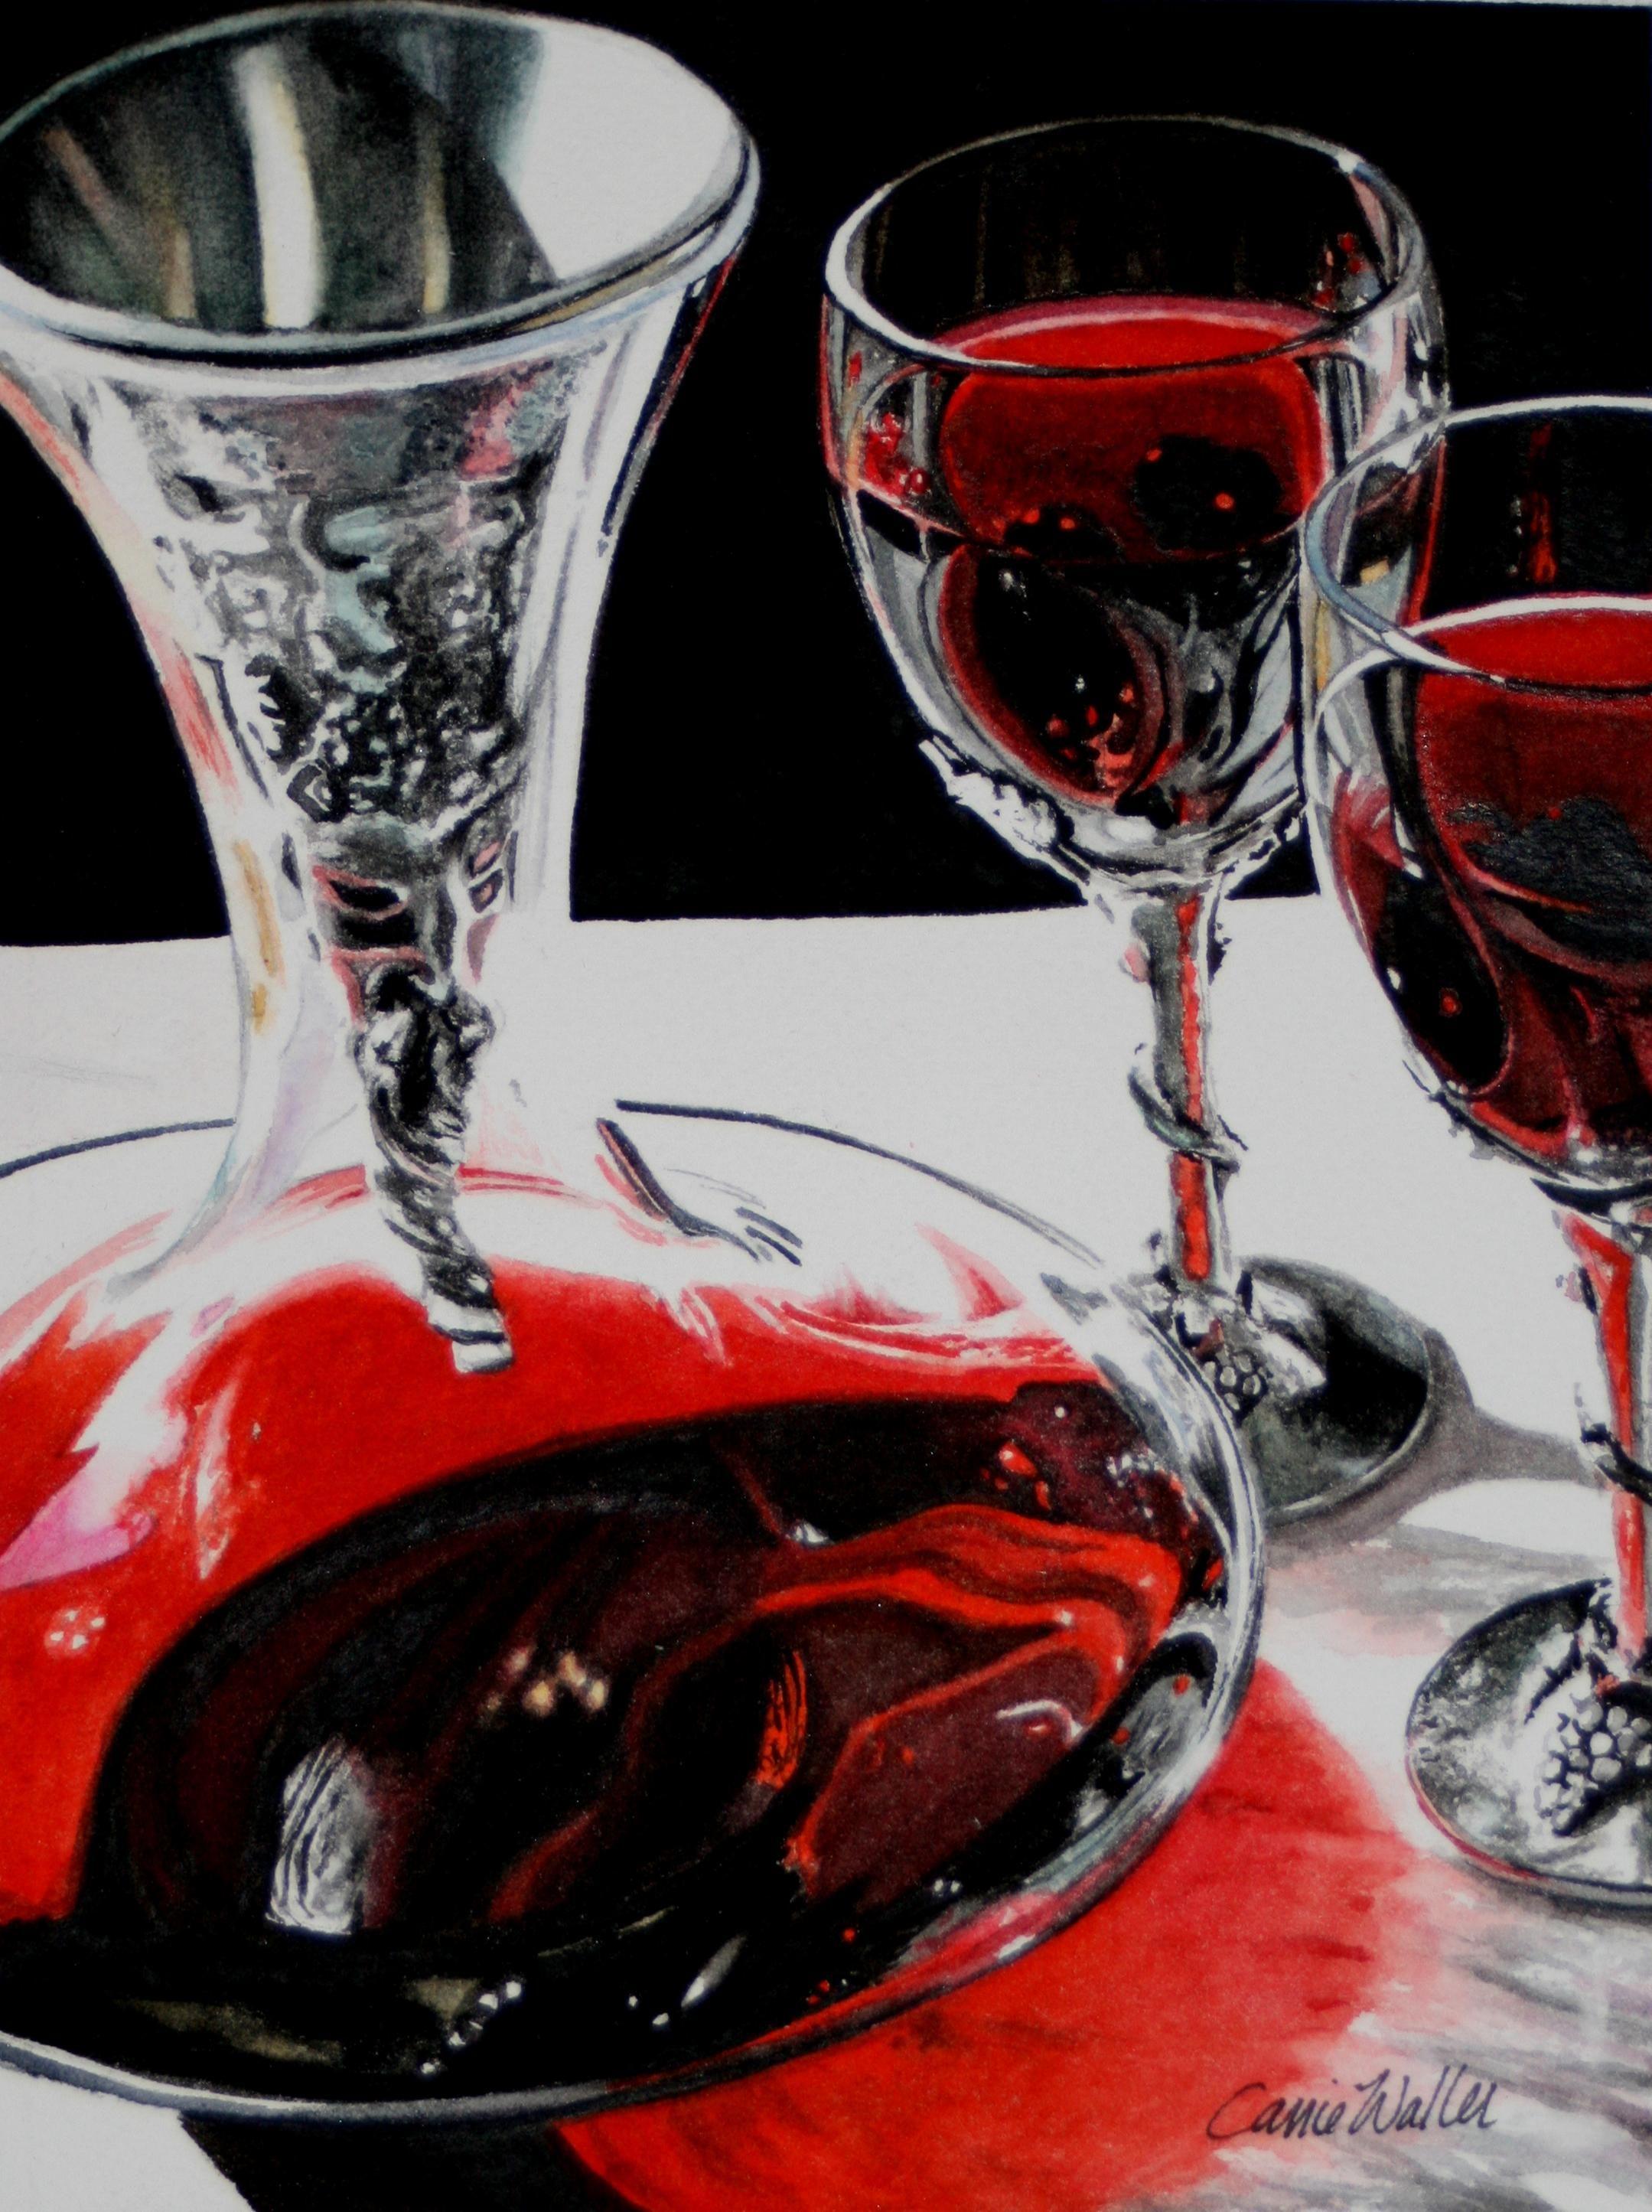 Bacchus The Wine God Watercolor On Paper By Carrie Waller Www Carriewallerfineart Com Peinture Acrylique Peinture Peintre